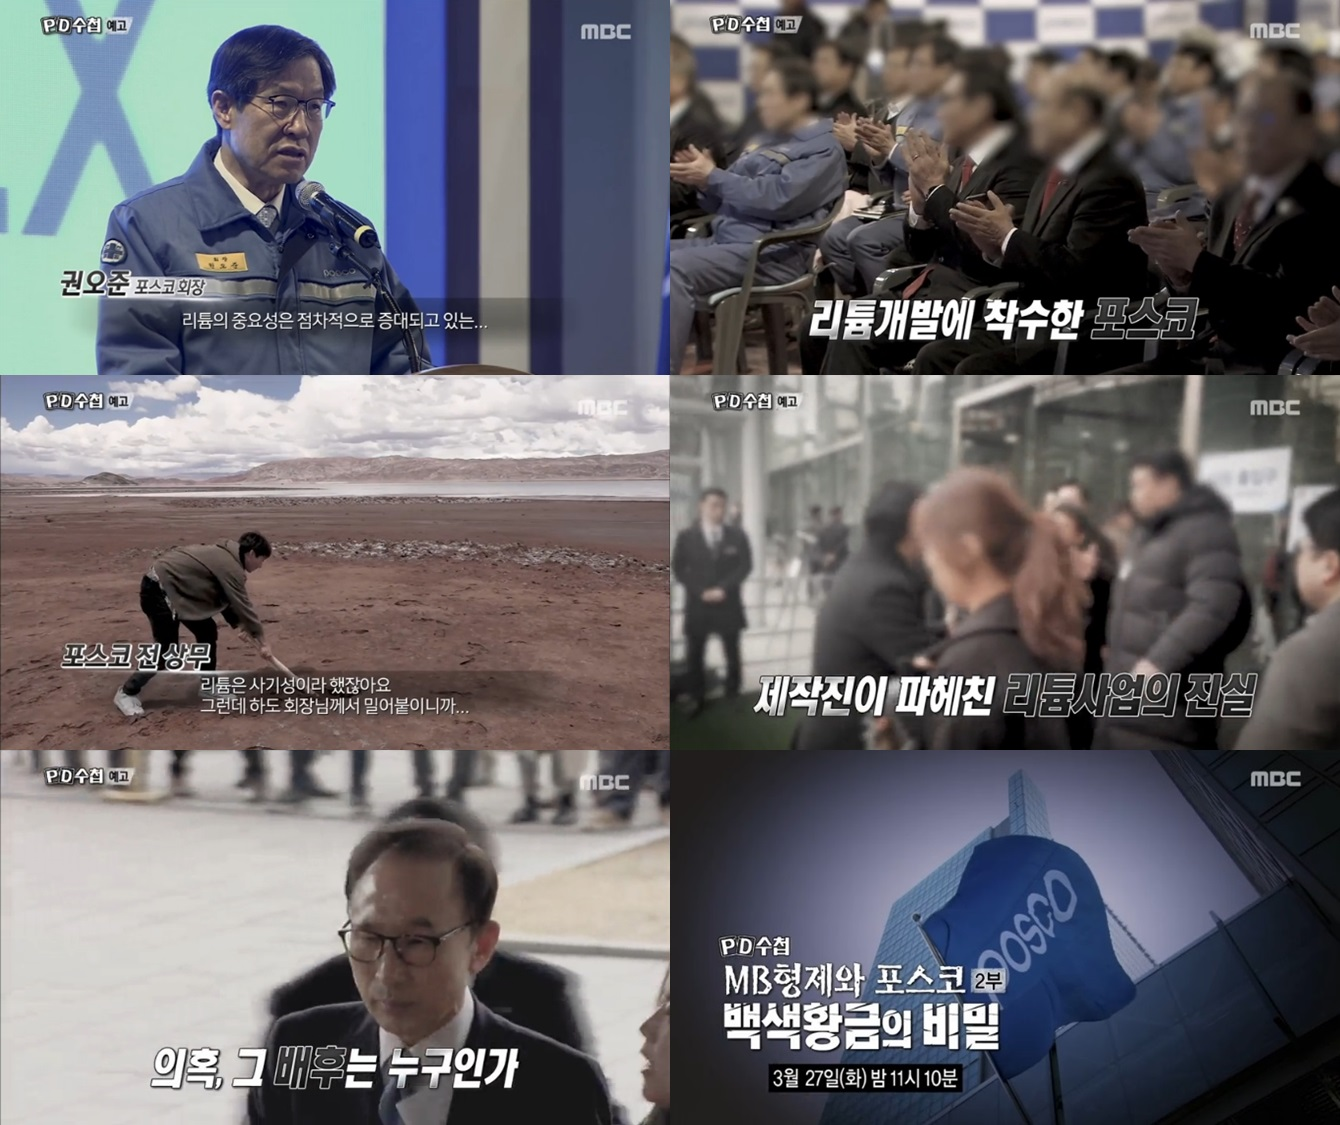 'PD수첩', MB정부 5년을 추적한다... 'MB형제와 포스코' 2탄 방송